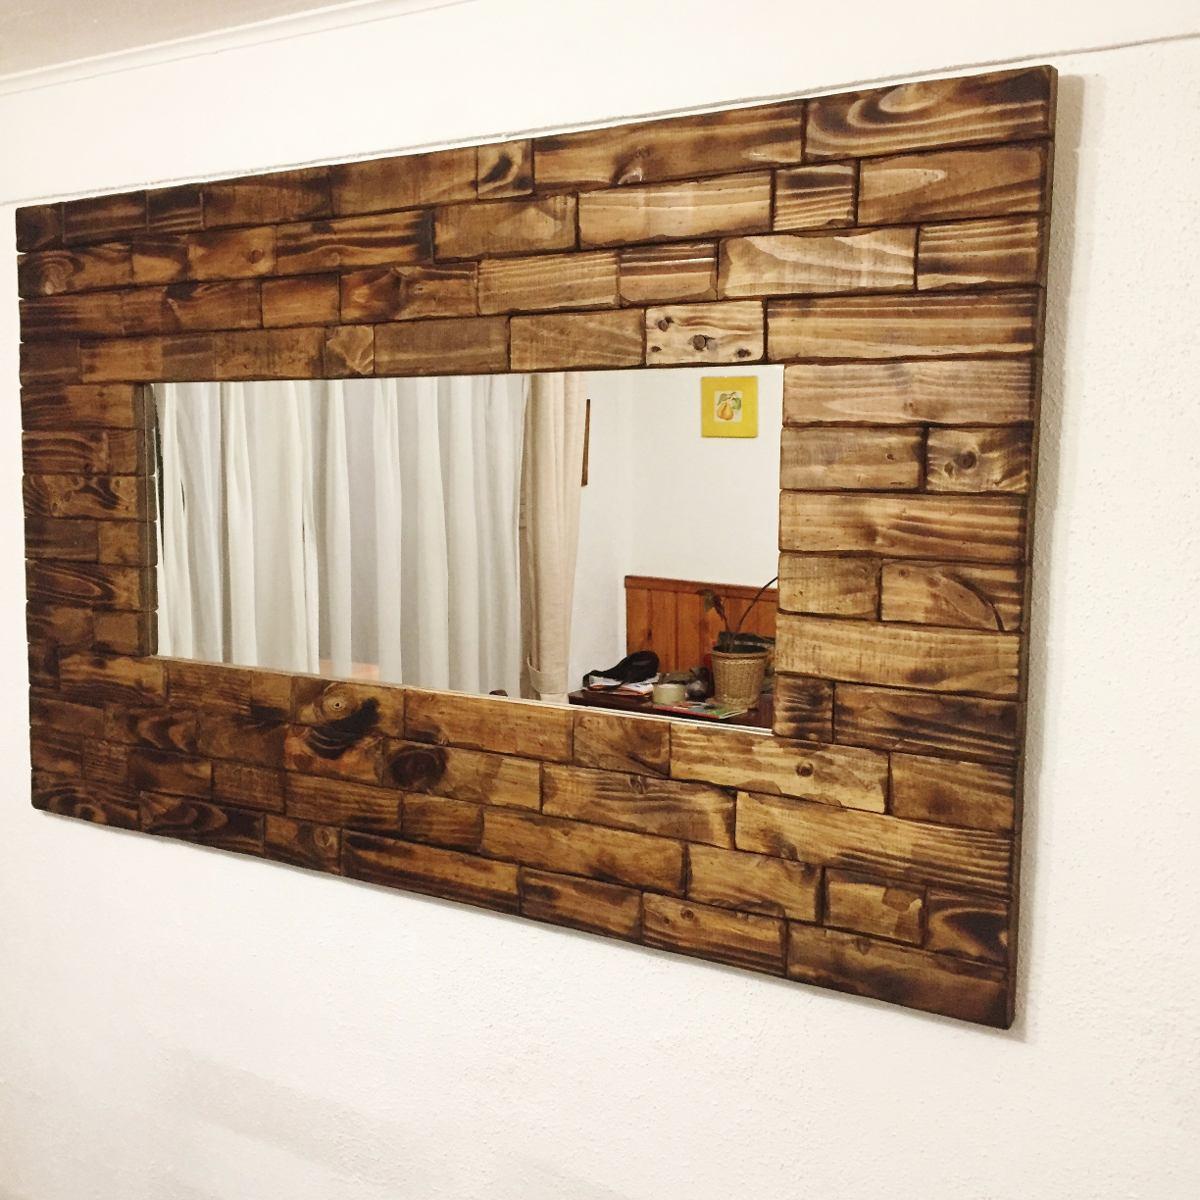 Espejo de madera rustico 140x80 aprox en for Espejo pared madera